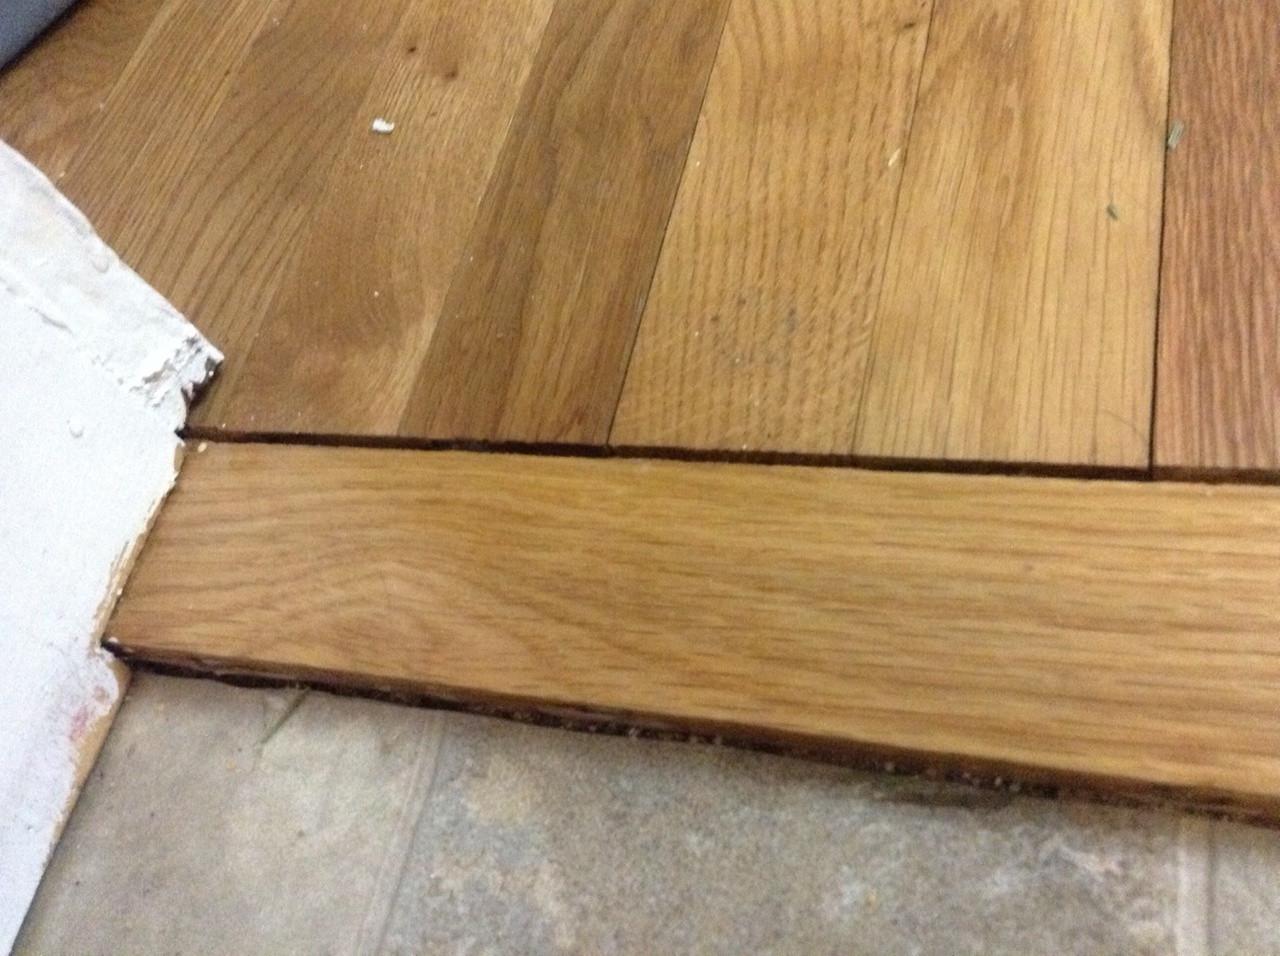 filling gaps in hardwood floors sawdust of wood floor techniques 101 with gap shrinkage cork